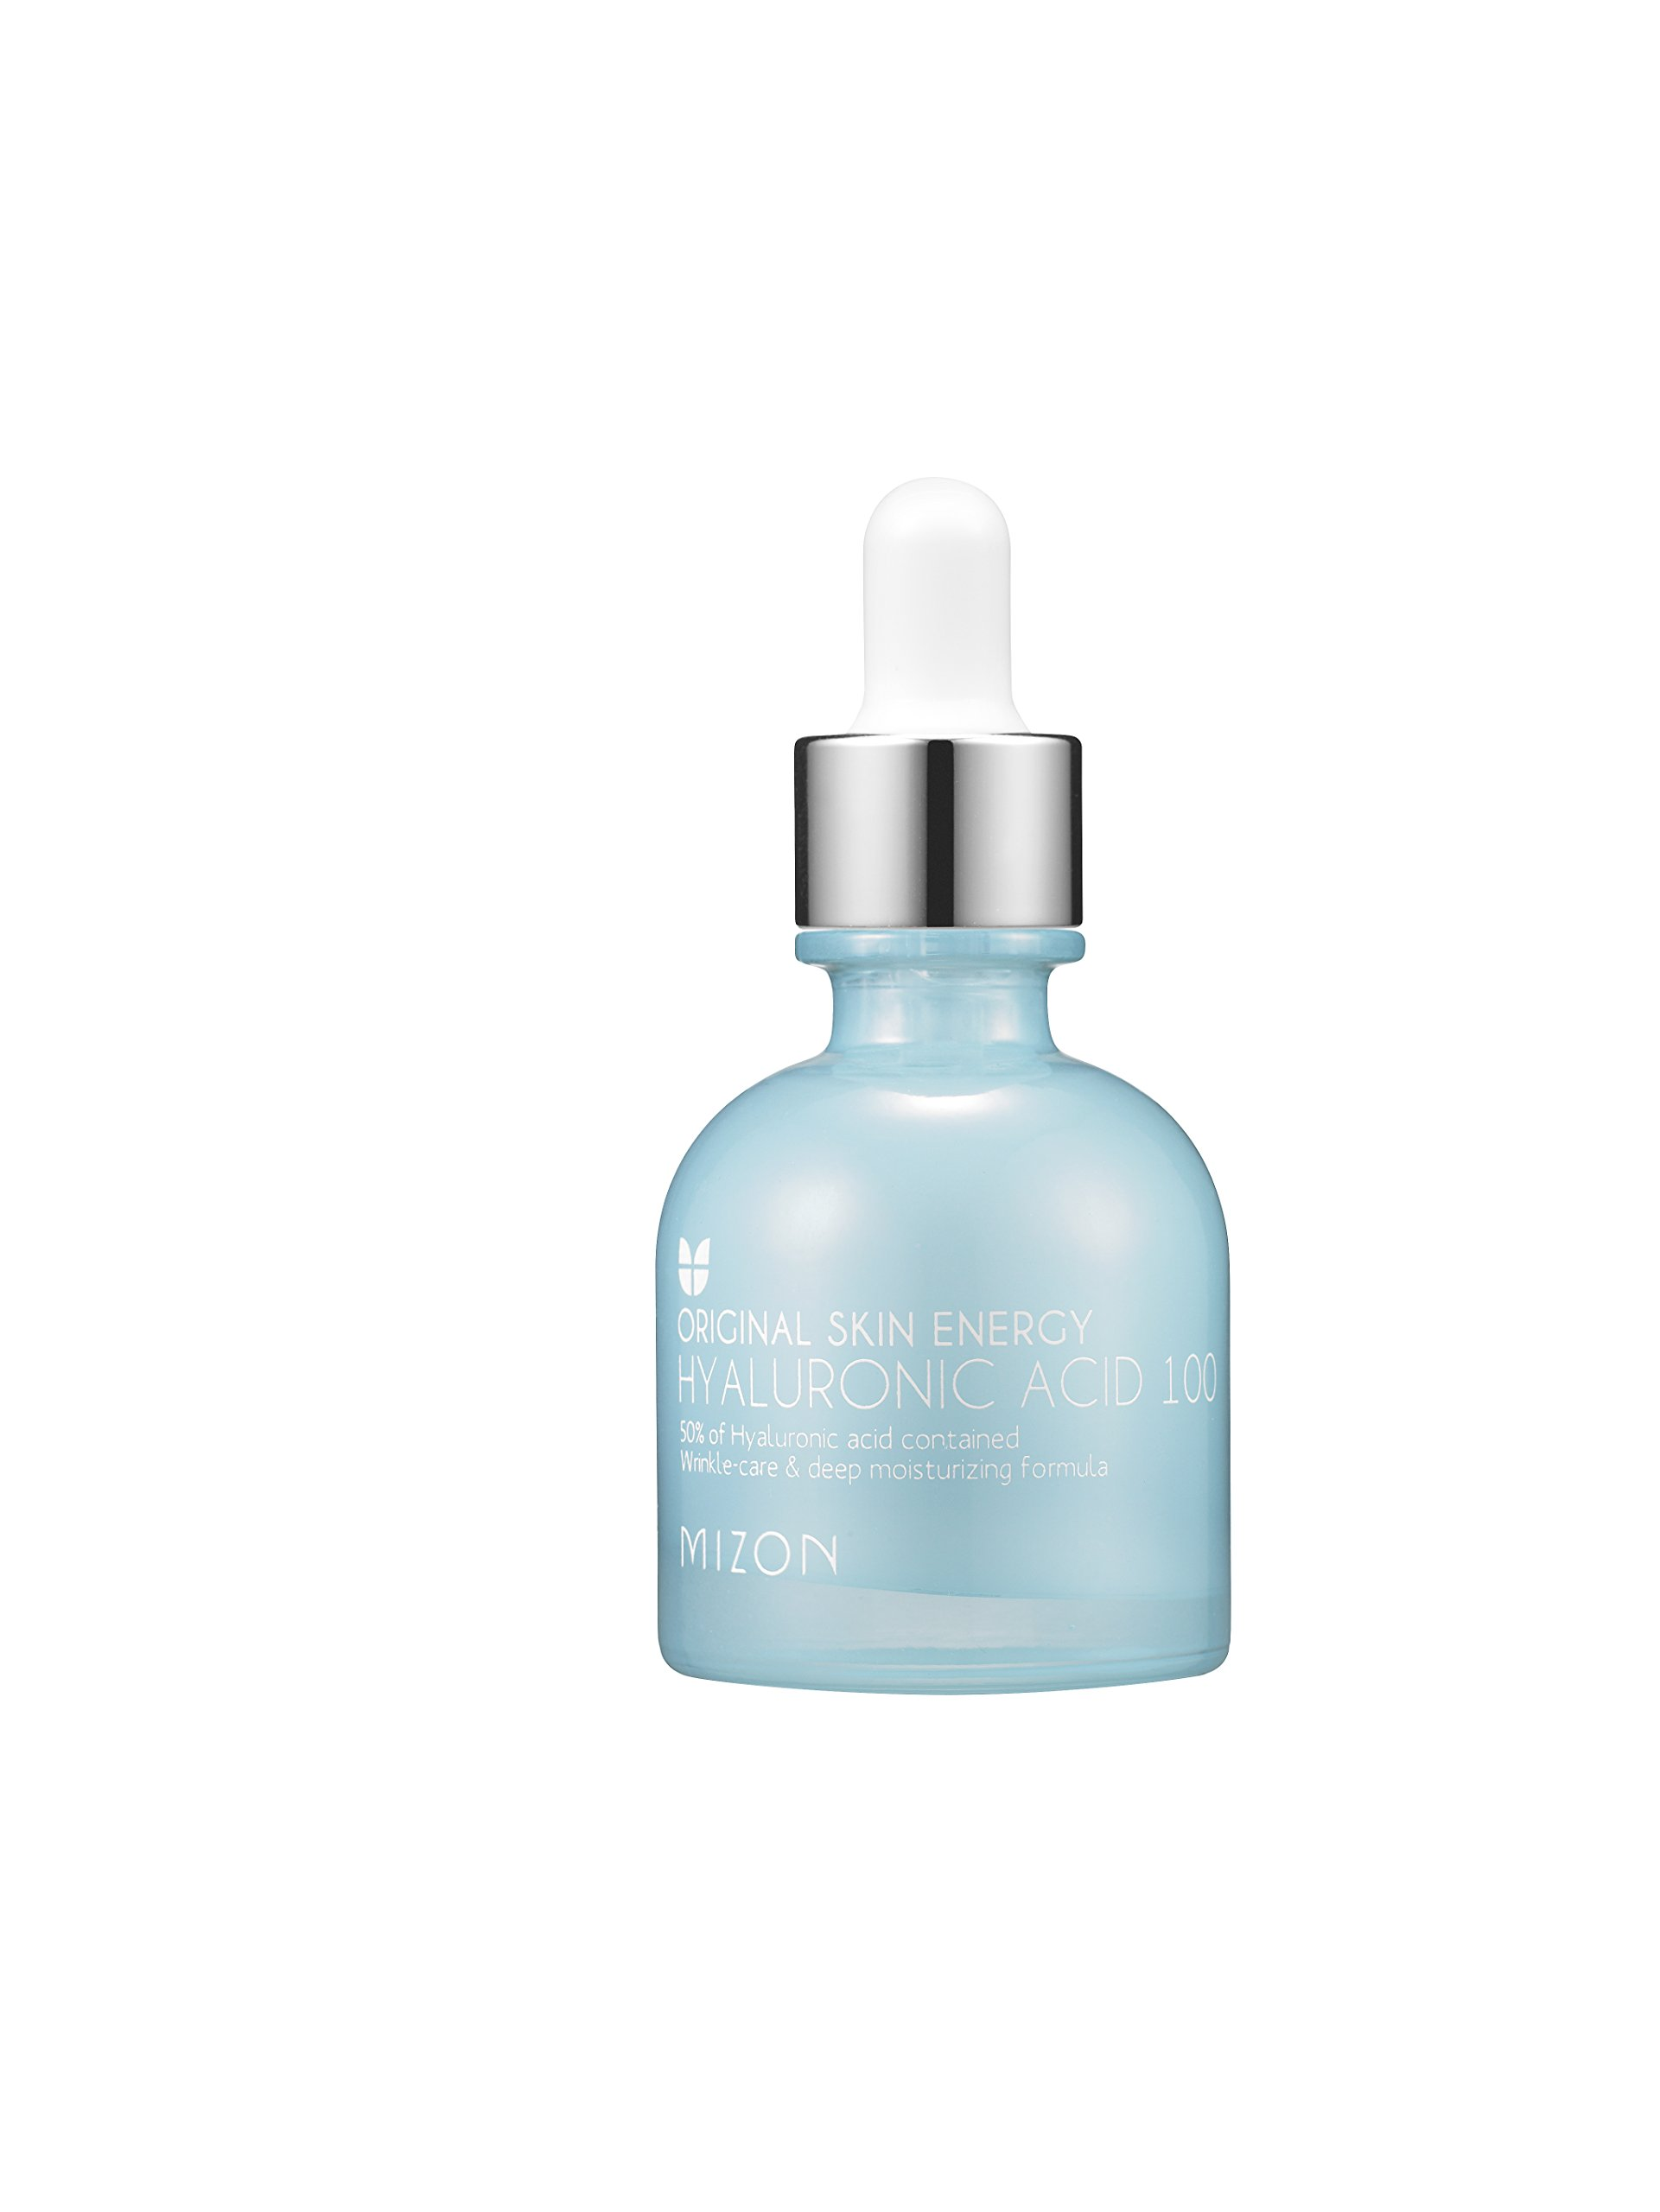 Mizon Original Skin Energy - Hyaluronic Acid 100 - Facial Care - Anti Wrinkle